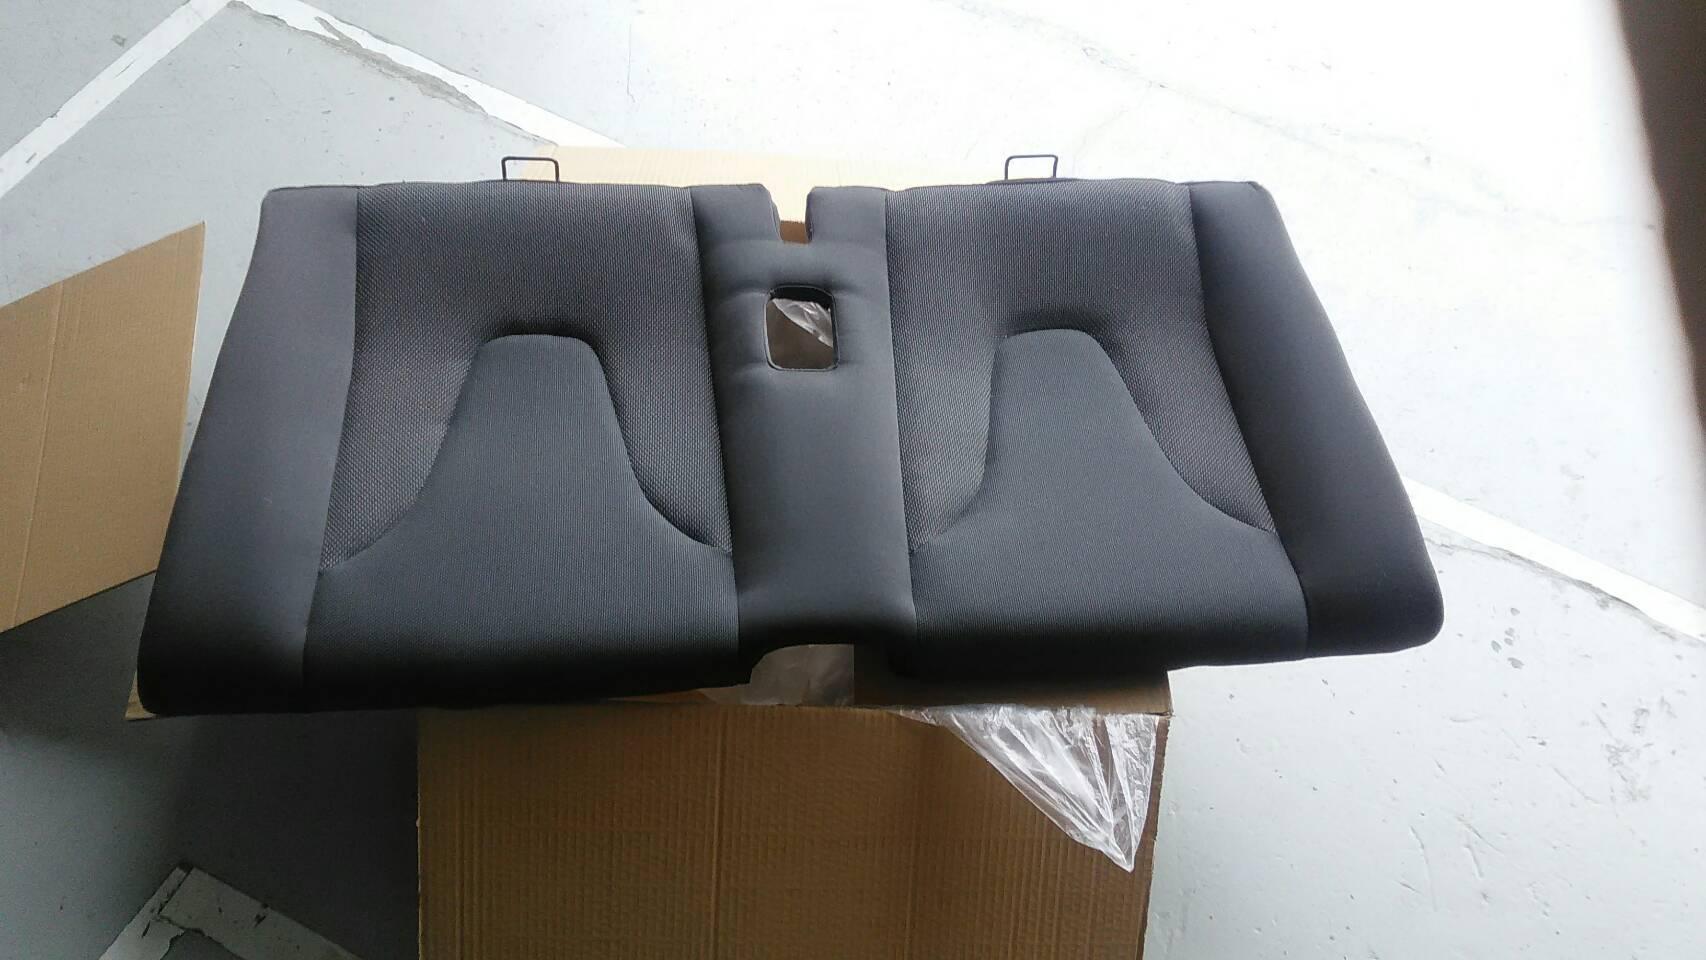 【TT】シートカバー取り付け